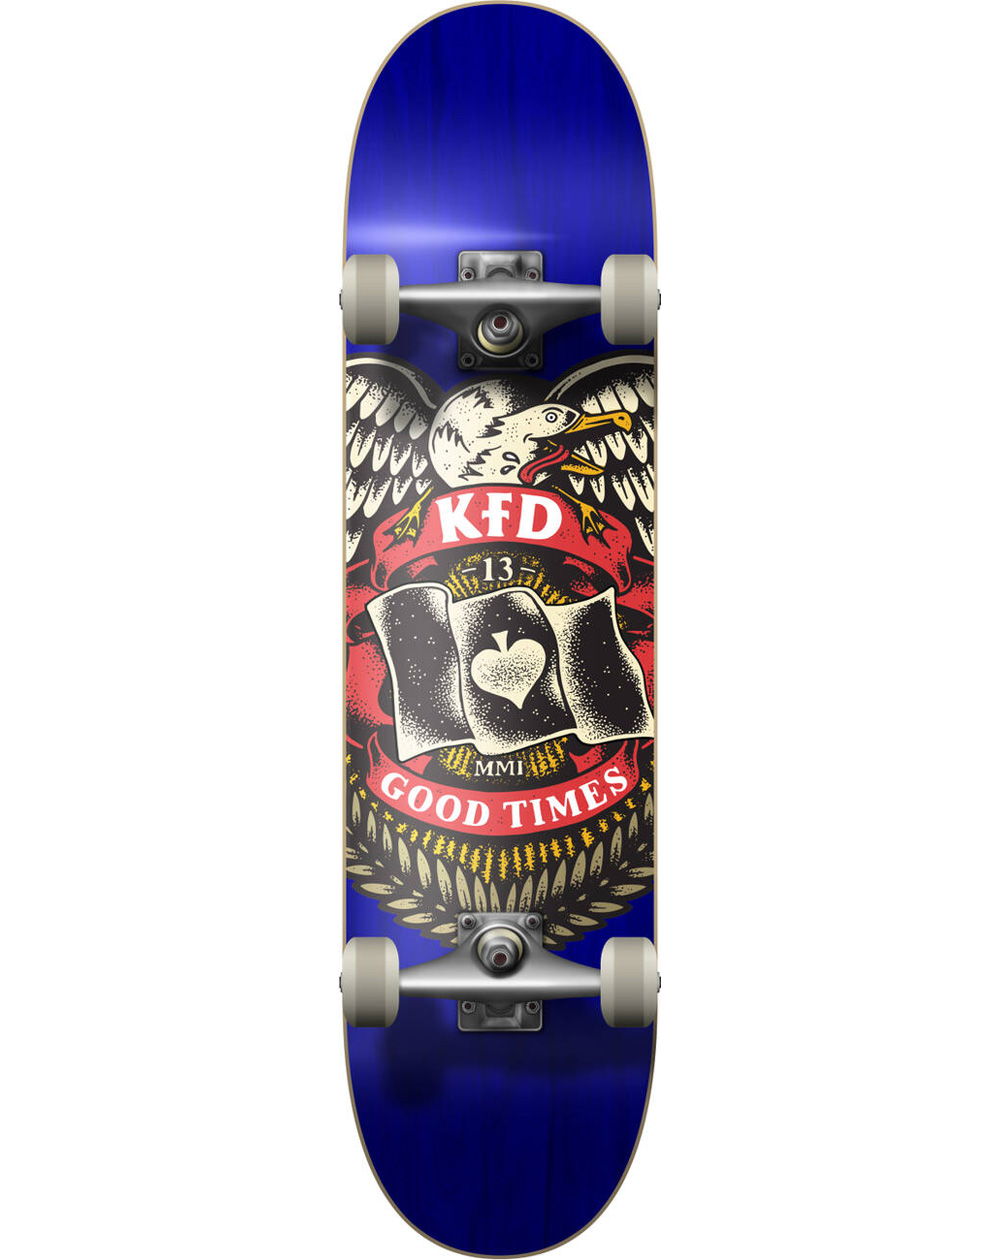 "KFD Skateboard Complète Young Gunz 7.75"" Badge Blue"